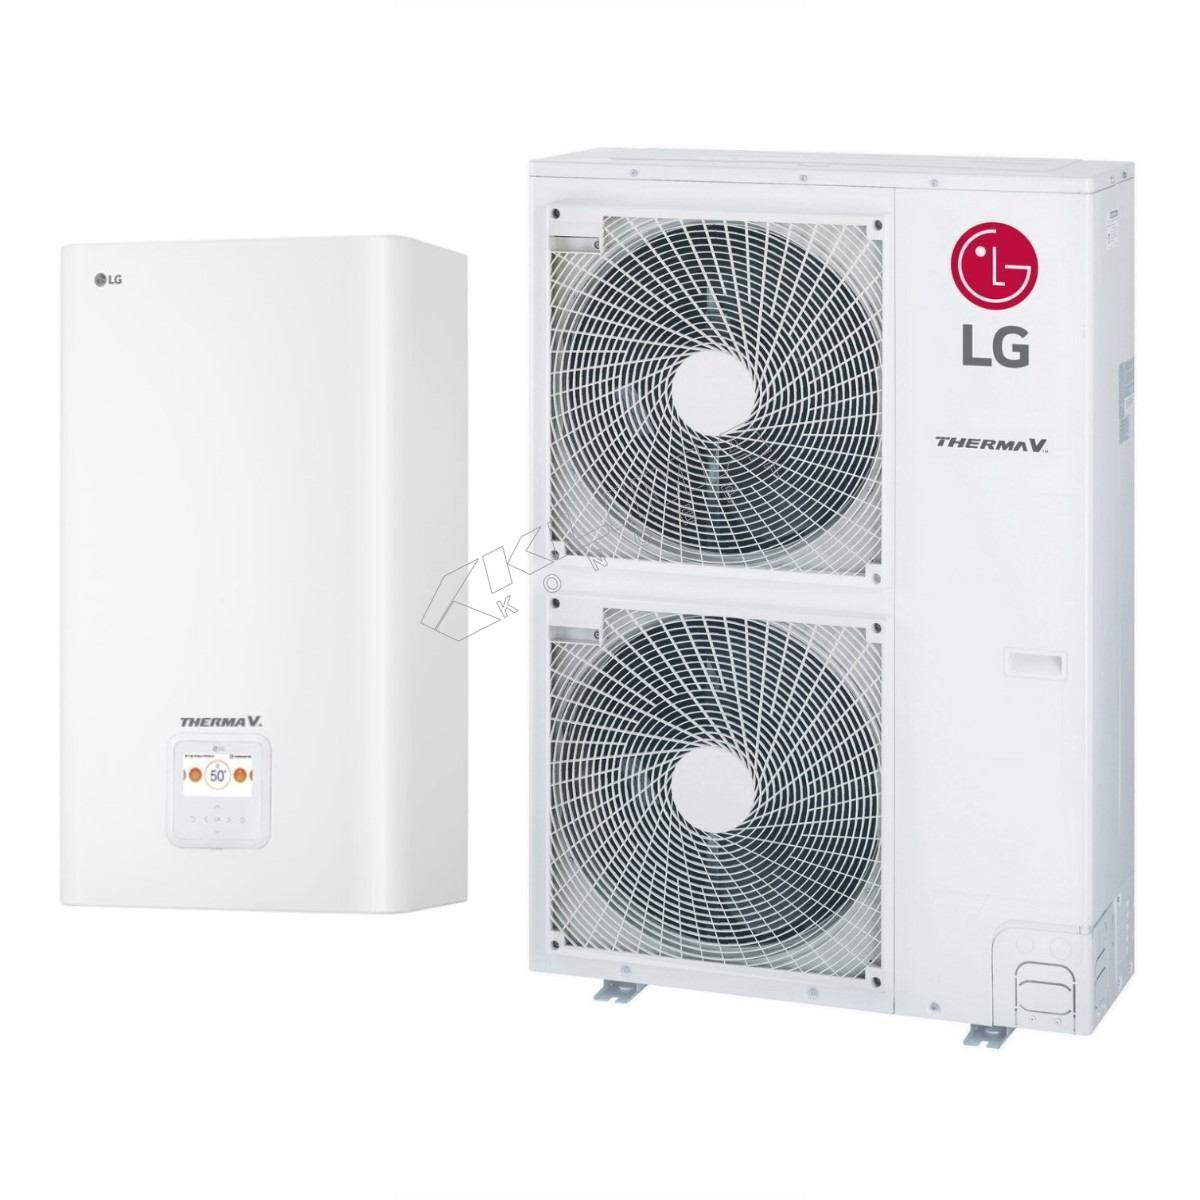 LG DIZALICA TOPLINE HN1639.NK3 / HU123.U33 R-410a TROFAZNA